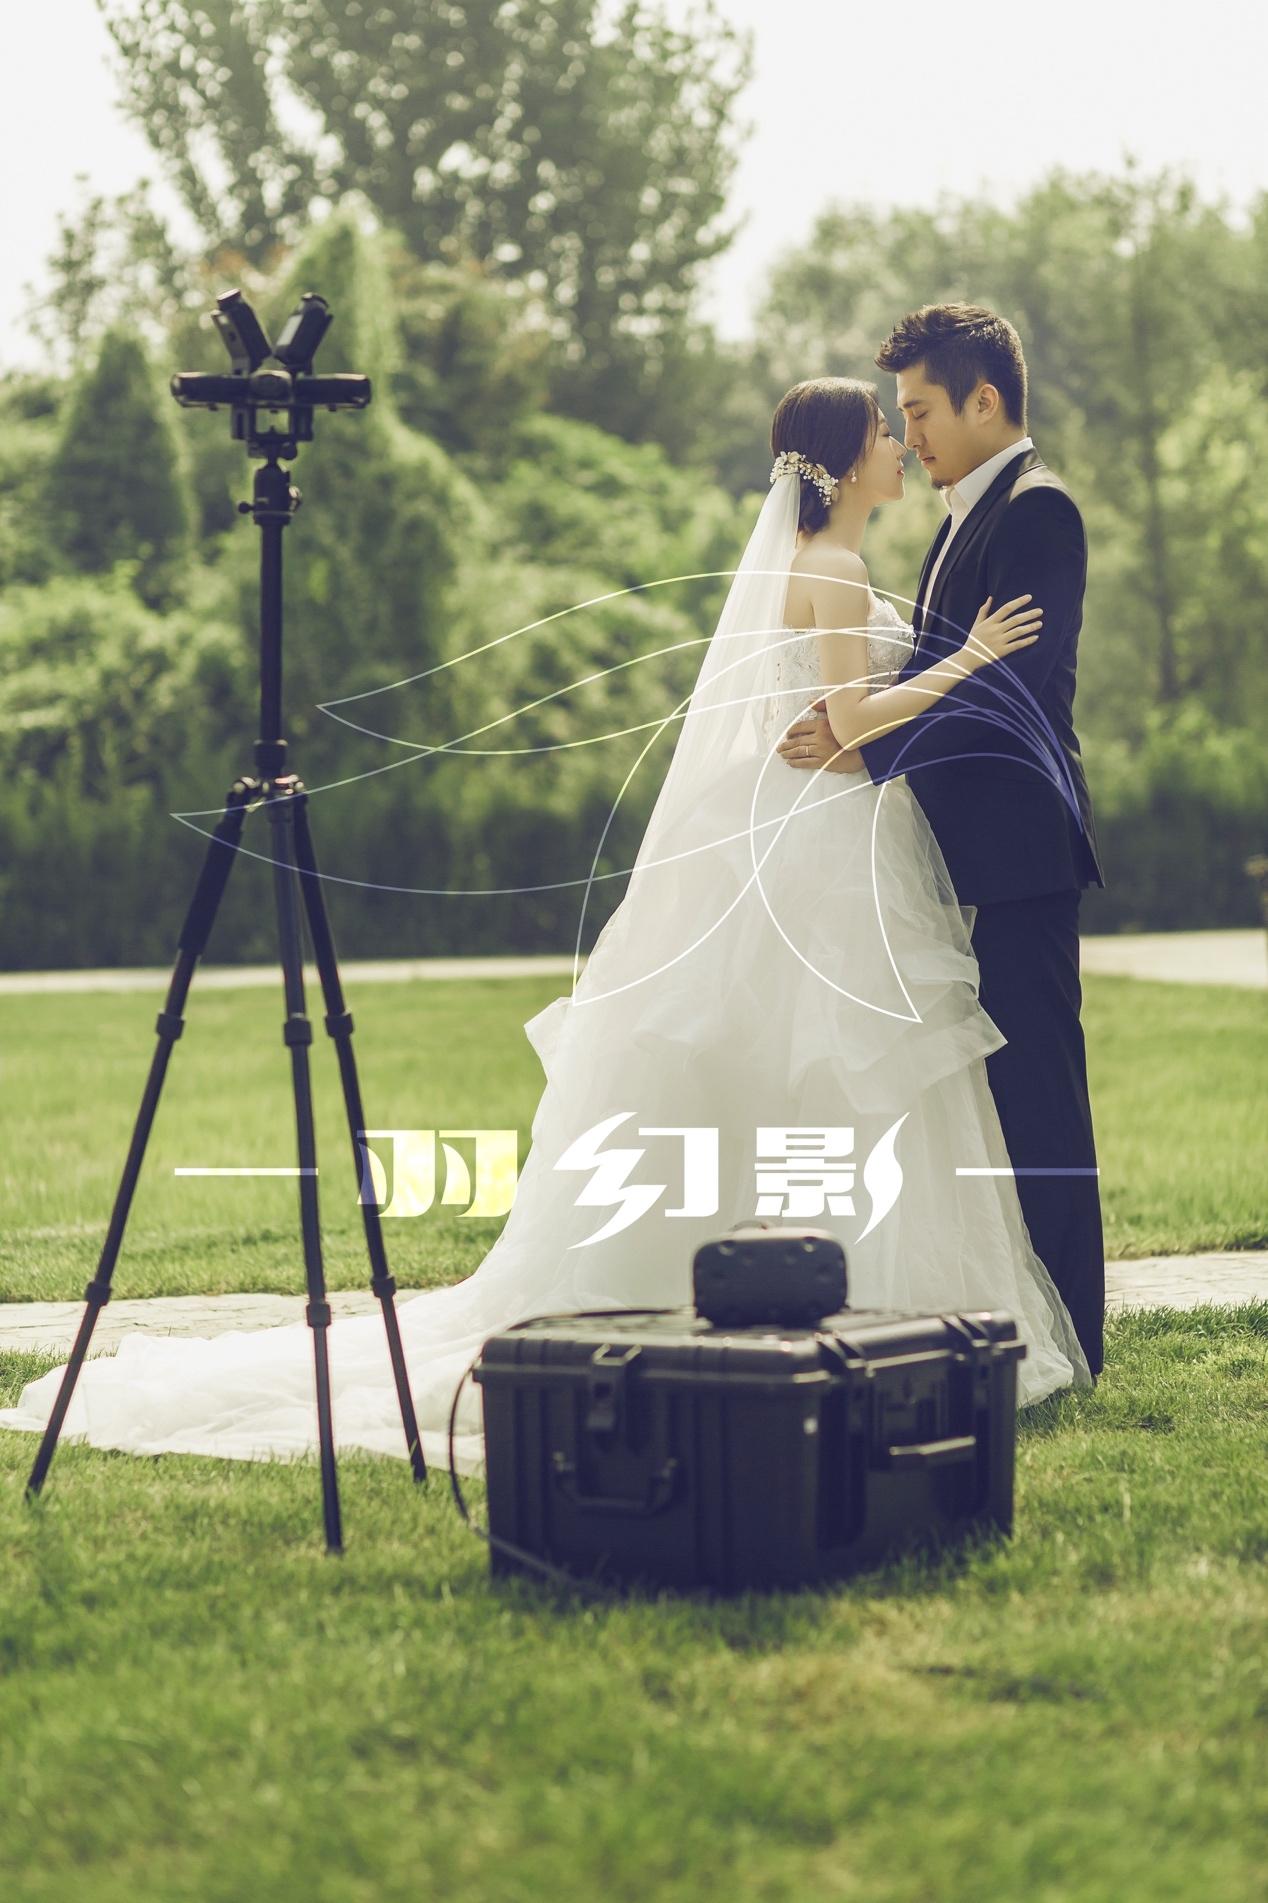 VR婚礼你见过么